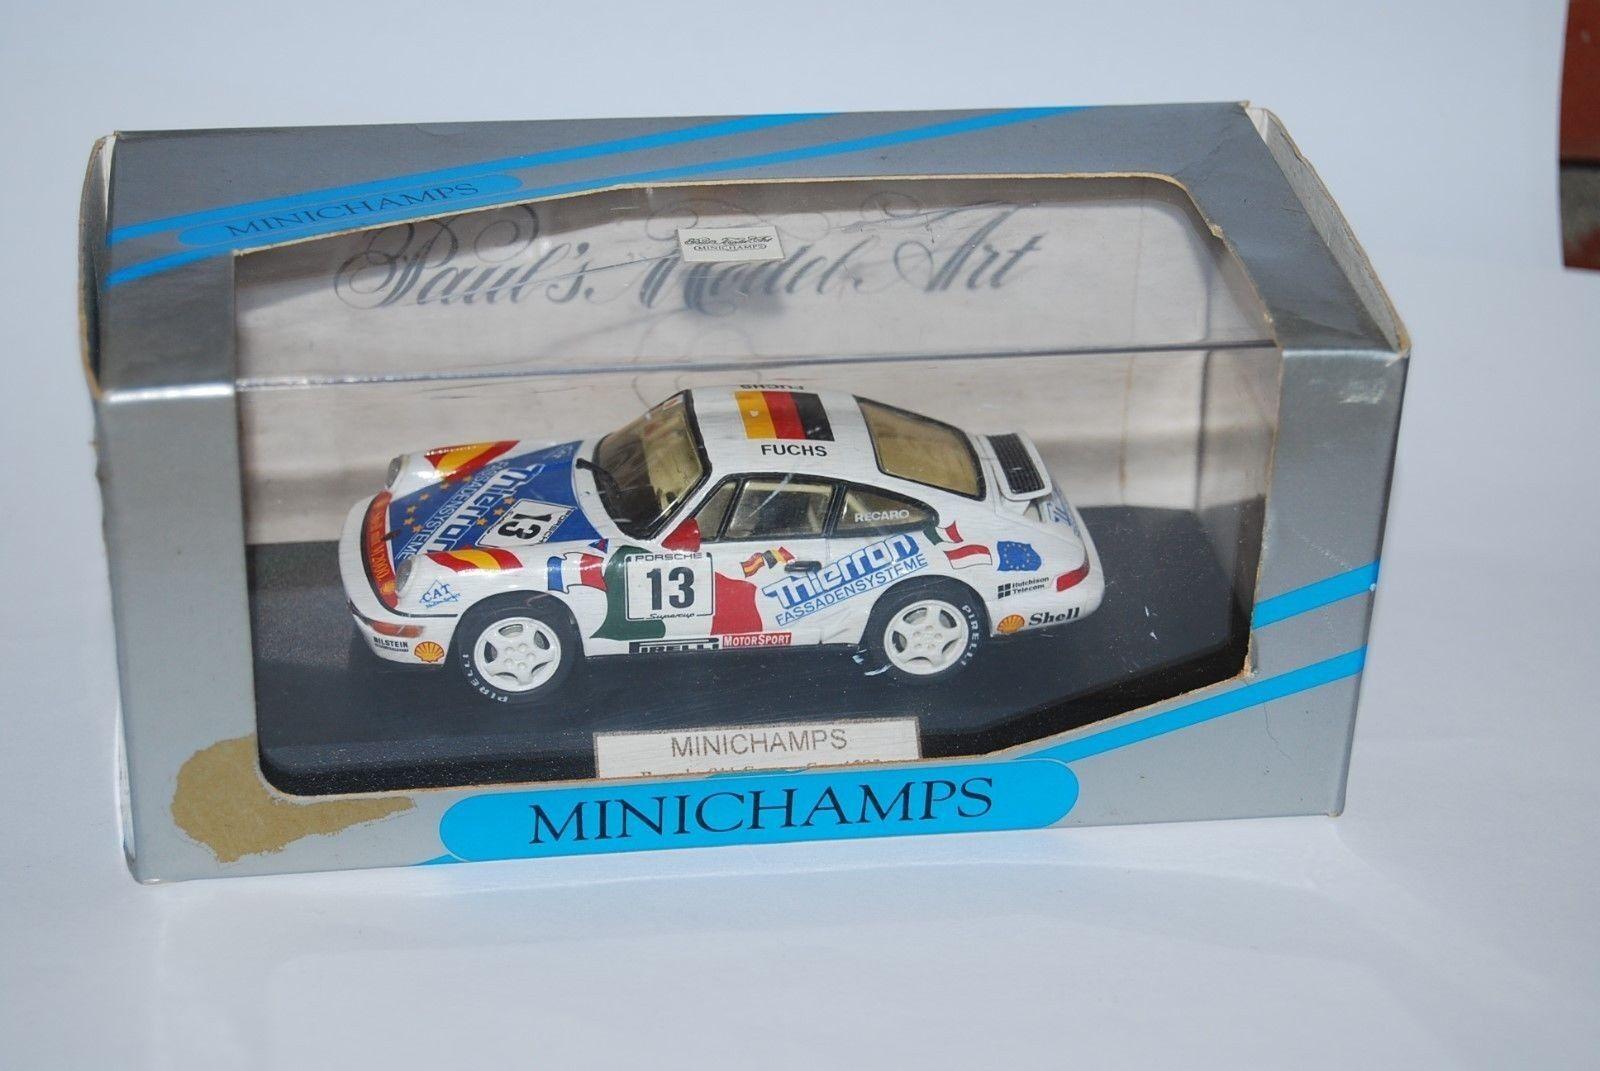 MINICHAMPS PORSCHE 911 CARRERA CUP 1993 A. FUCHS NEUF BOITE NEW BOX 1 43